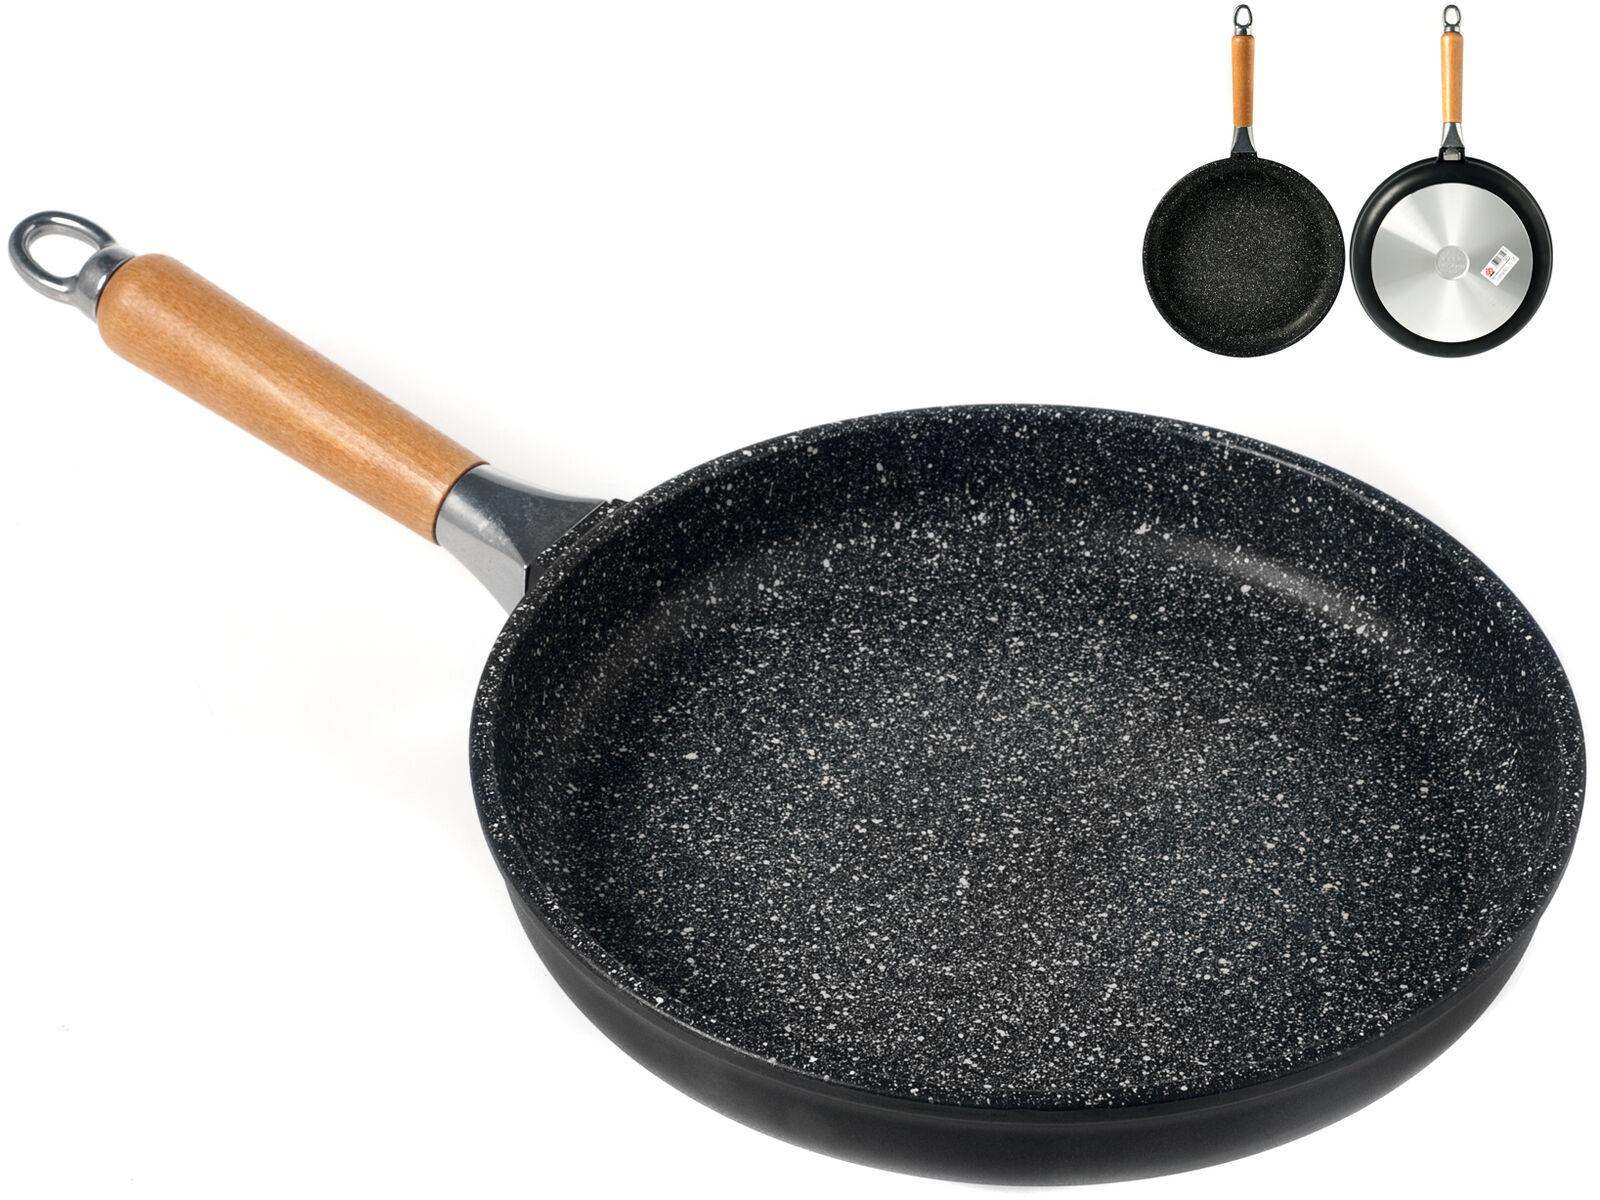 H&H Padella Bassa Antiaderente Pietra Manico In Legno Cm28 pentola da cucina